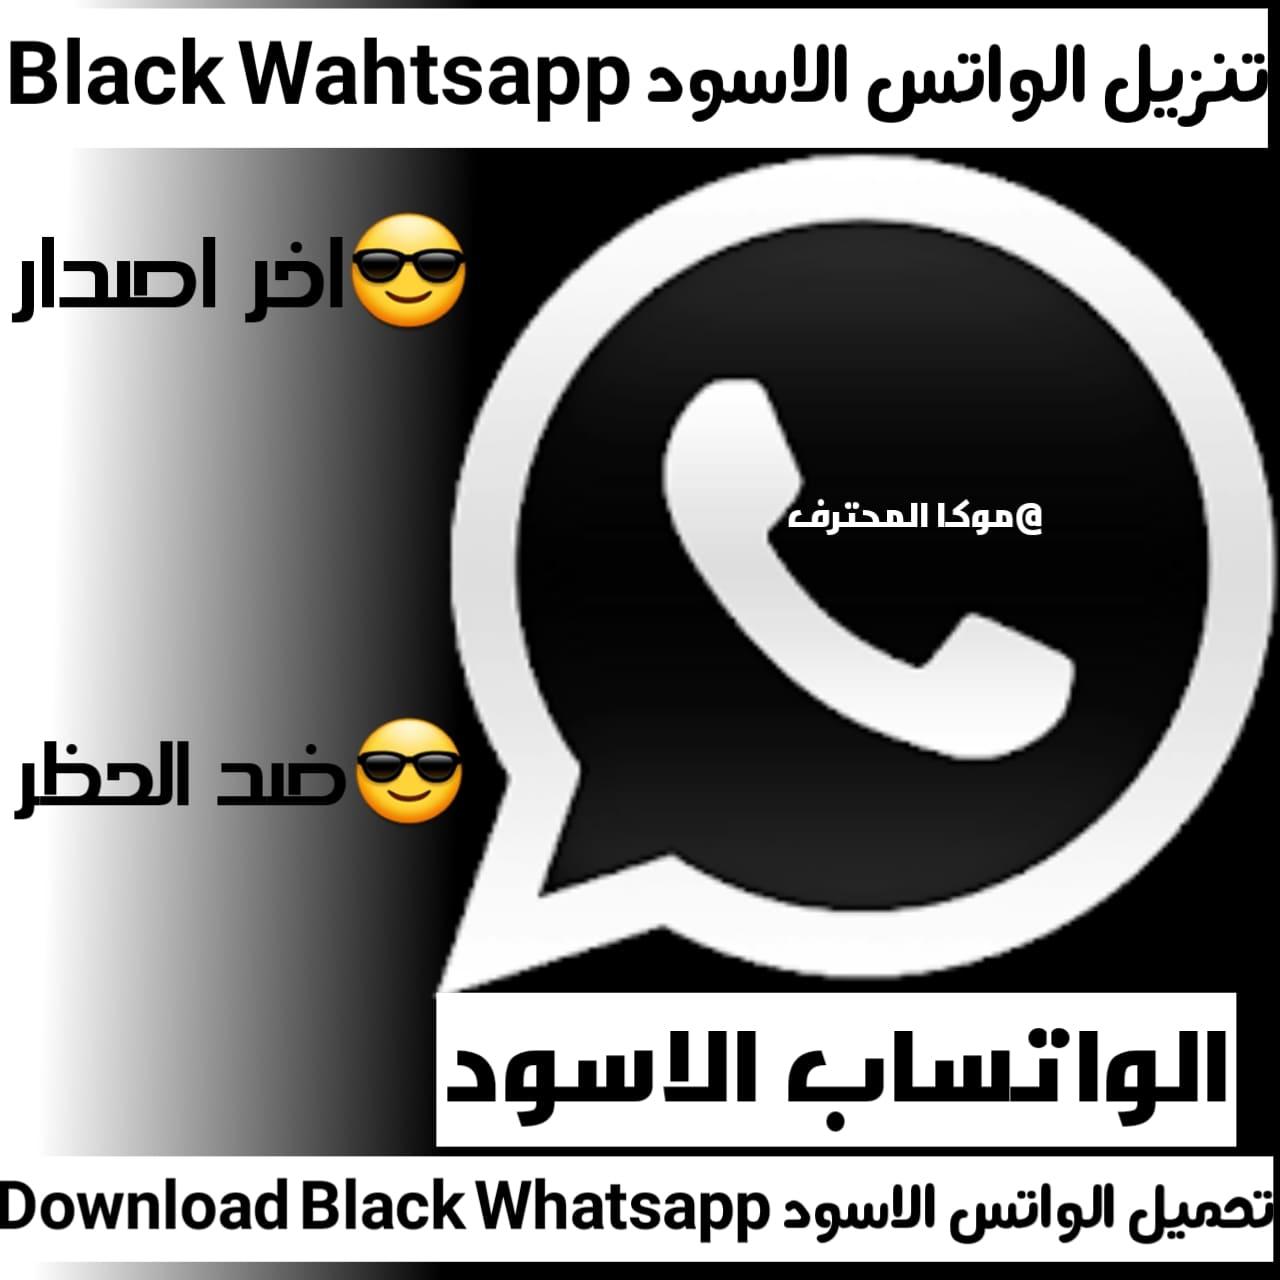 تحميل واتس اب الاسود Black Whatsapp الواتس الاسود اخر اصدار ضد الحظر